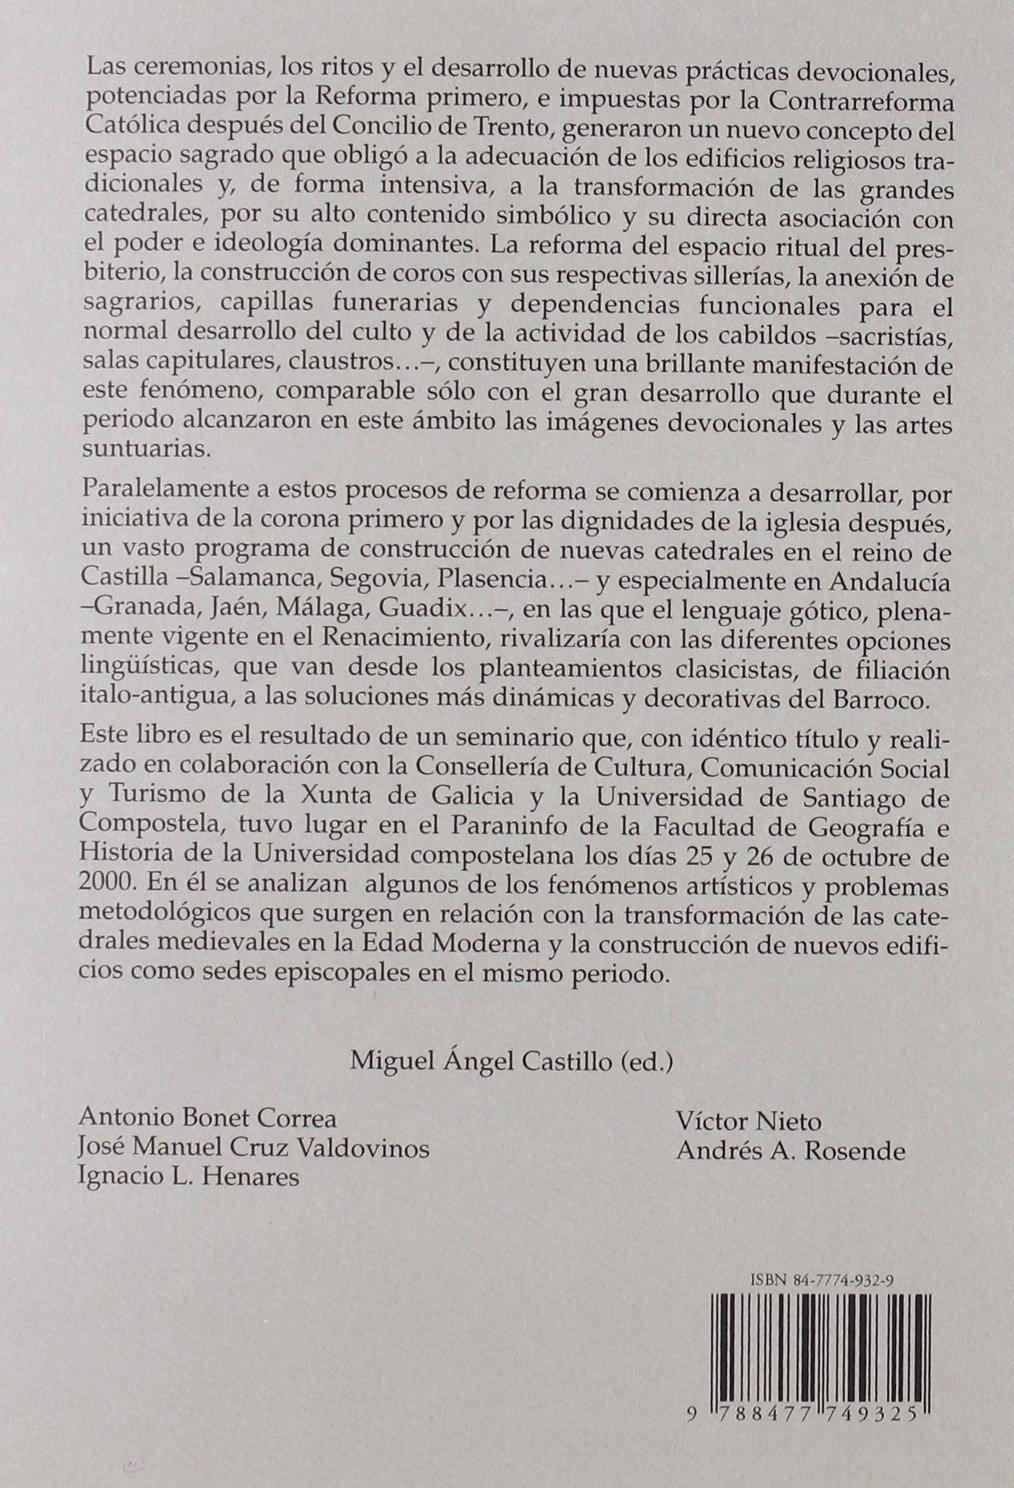 Las Catedrales Espanolas en la Edad Moderna: 9788477749325: Amazon.com: Books